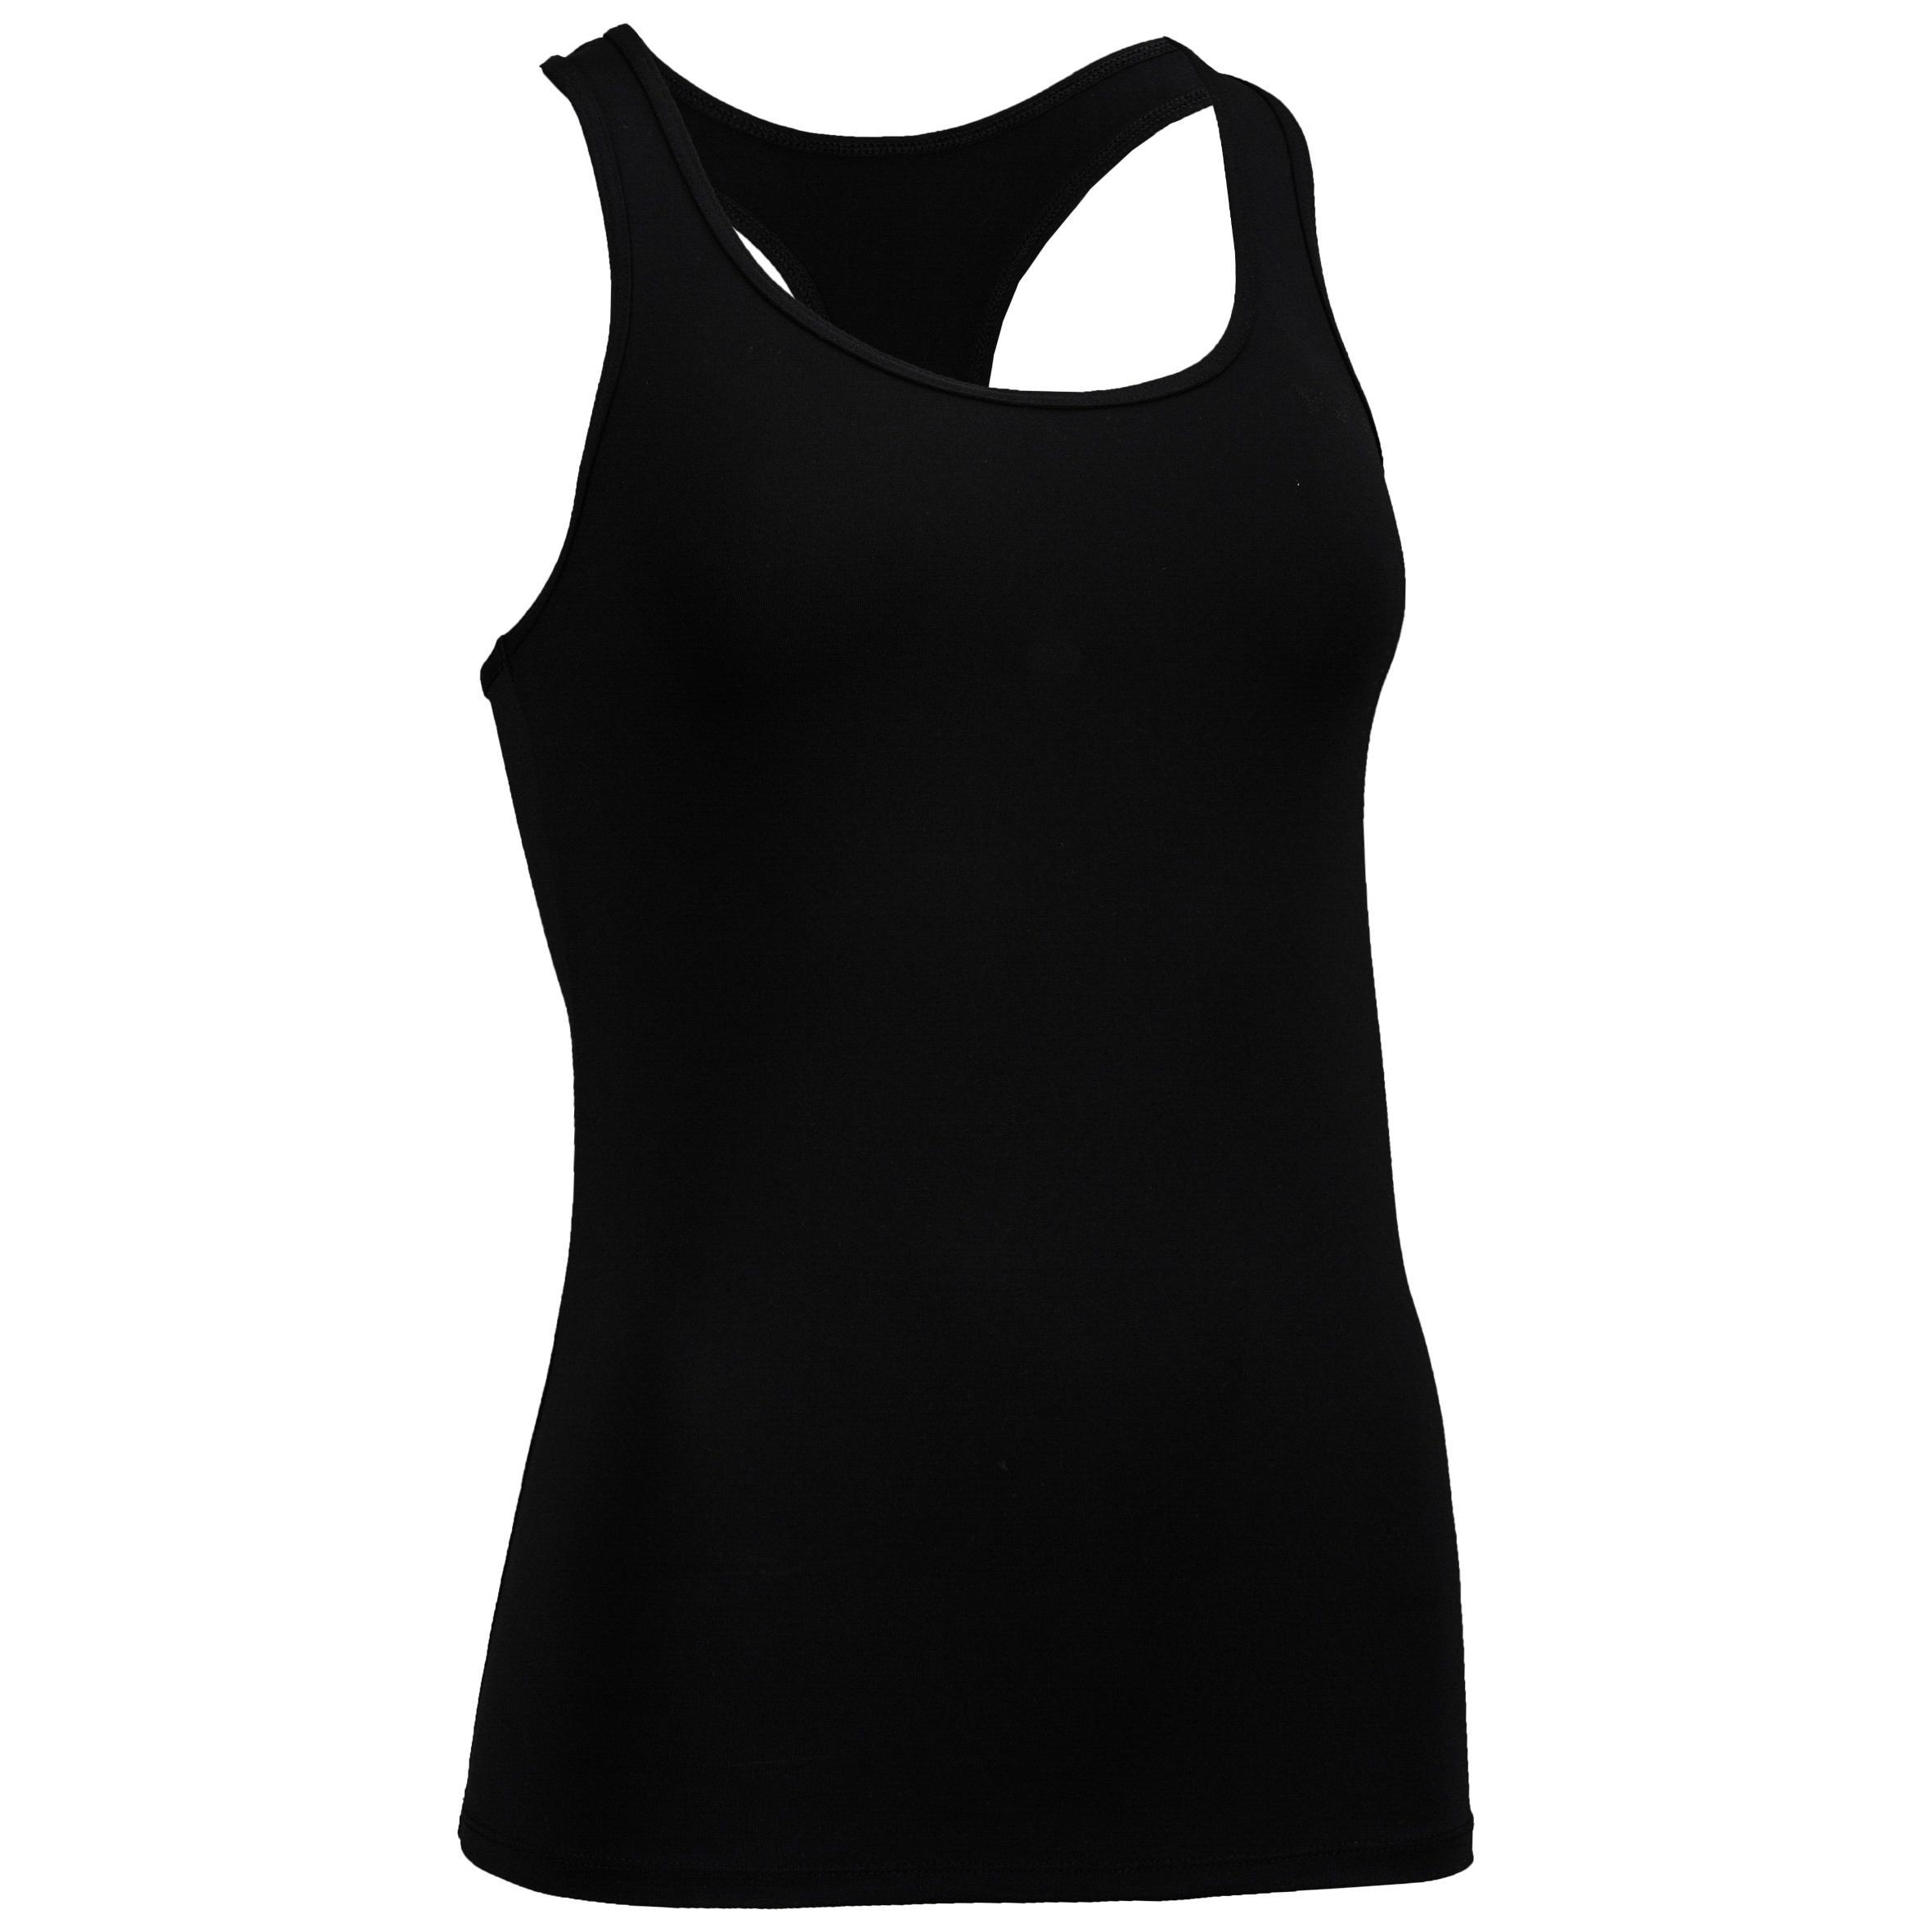 100 My Top Women's Cardio Fitness Tank Top - Black